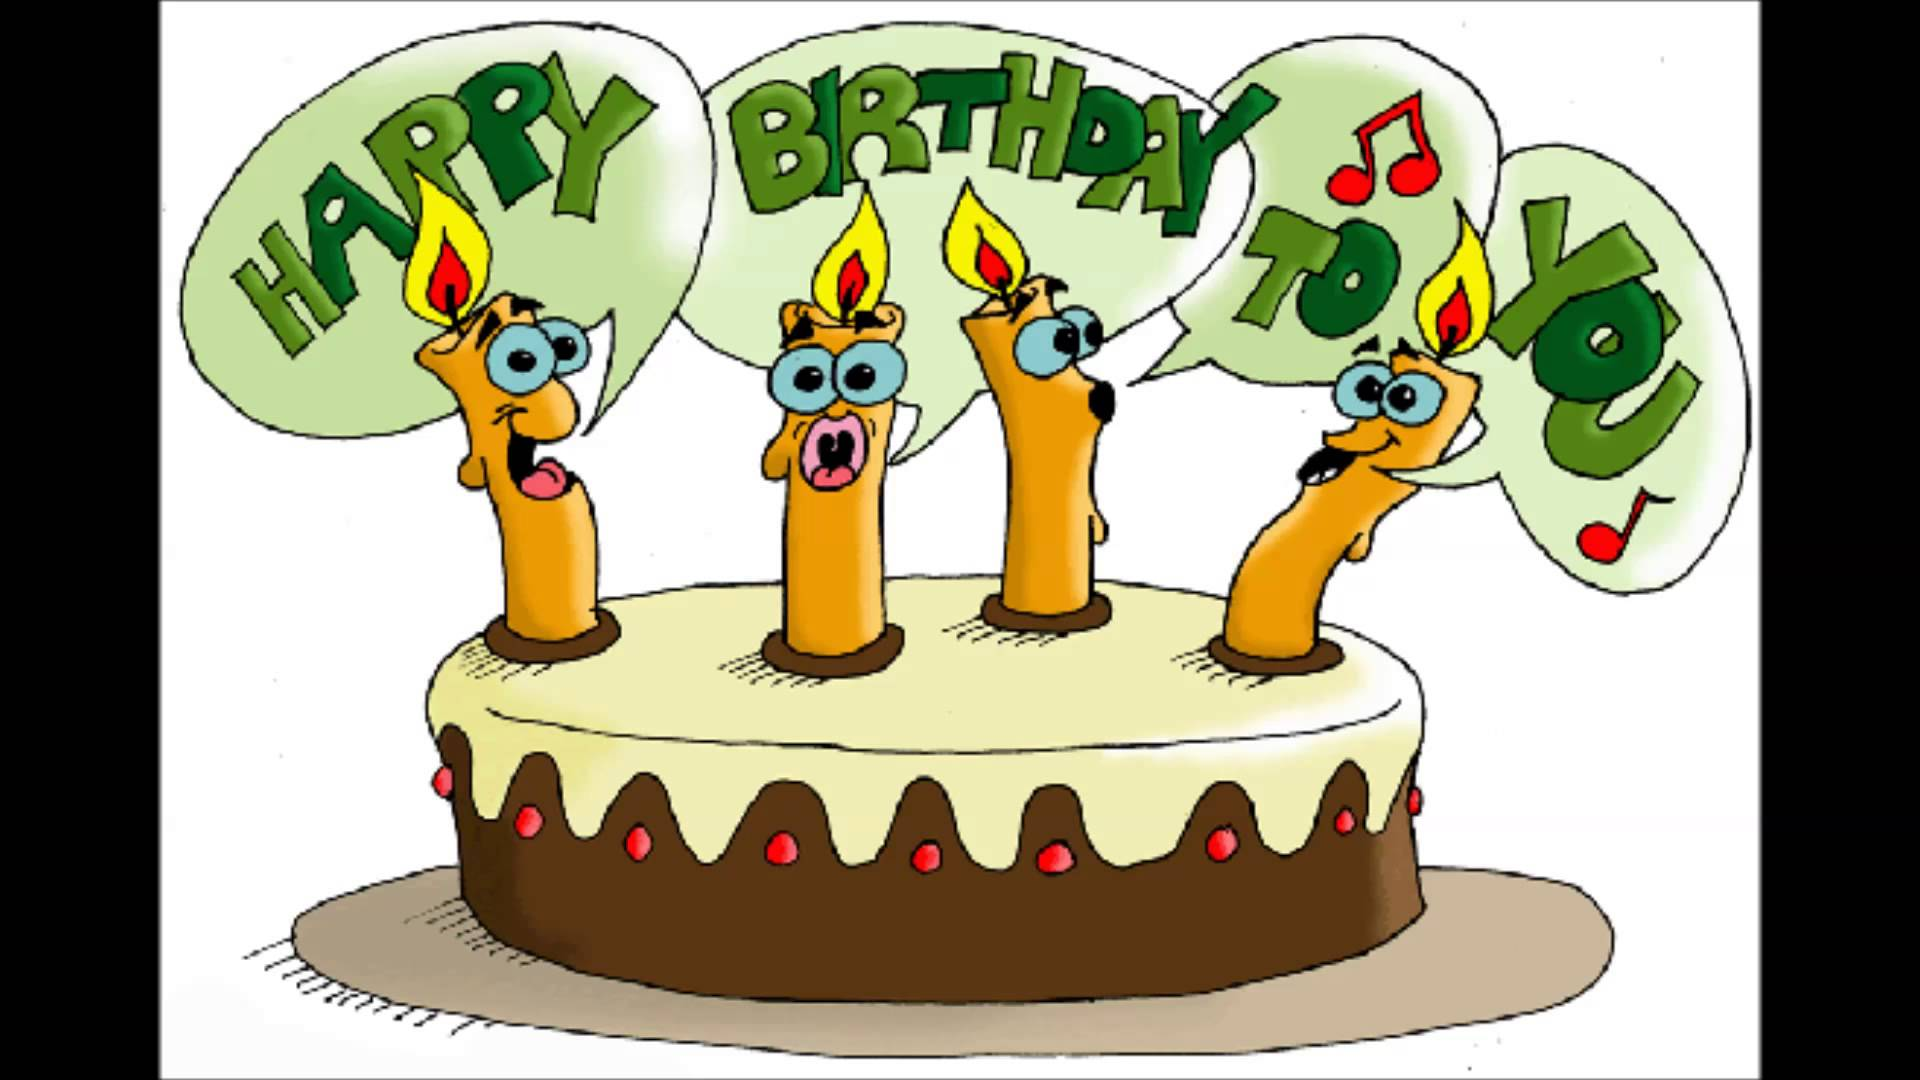 Geburtstag torte clipart image freeuse Happy Birthday Cousin'chen - YouTube image freeuse